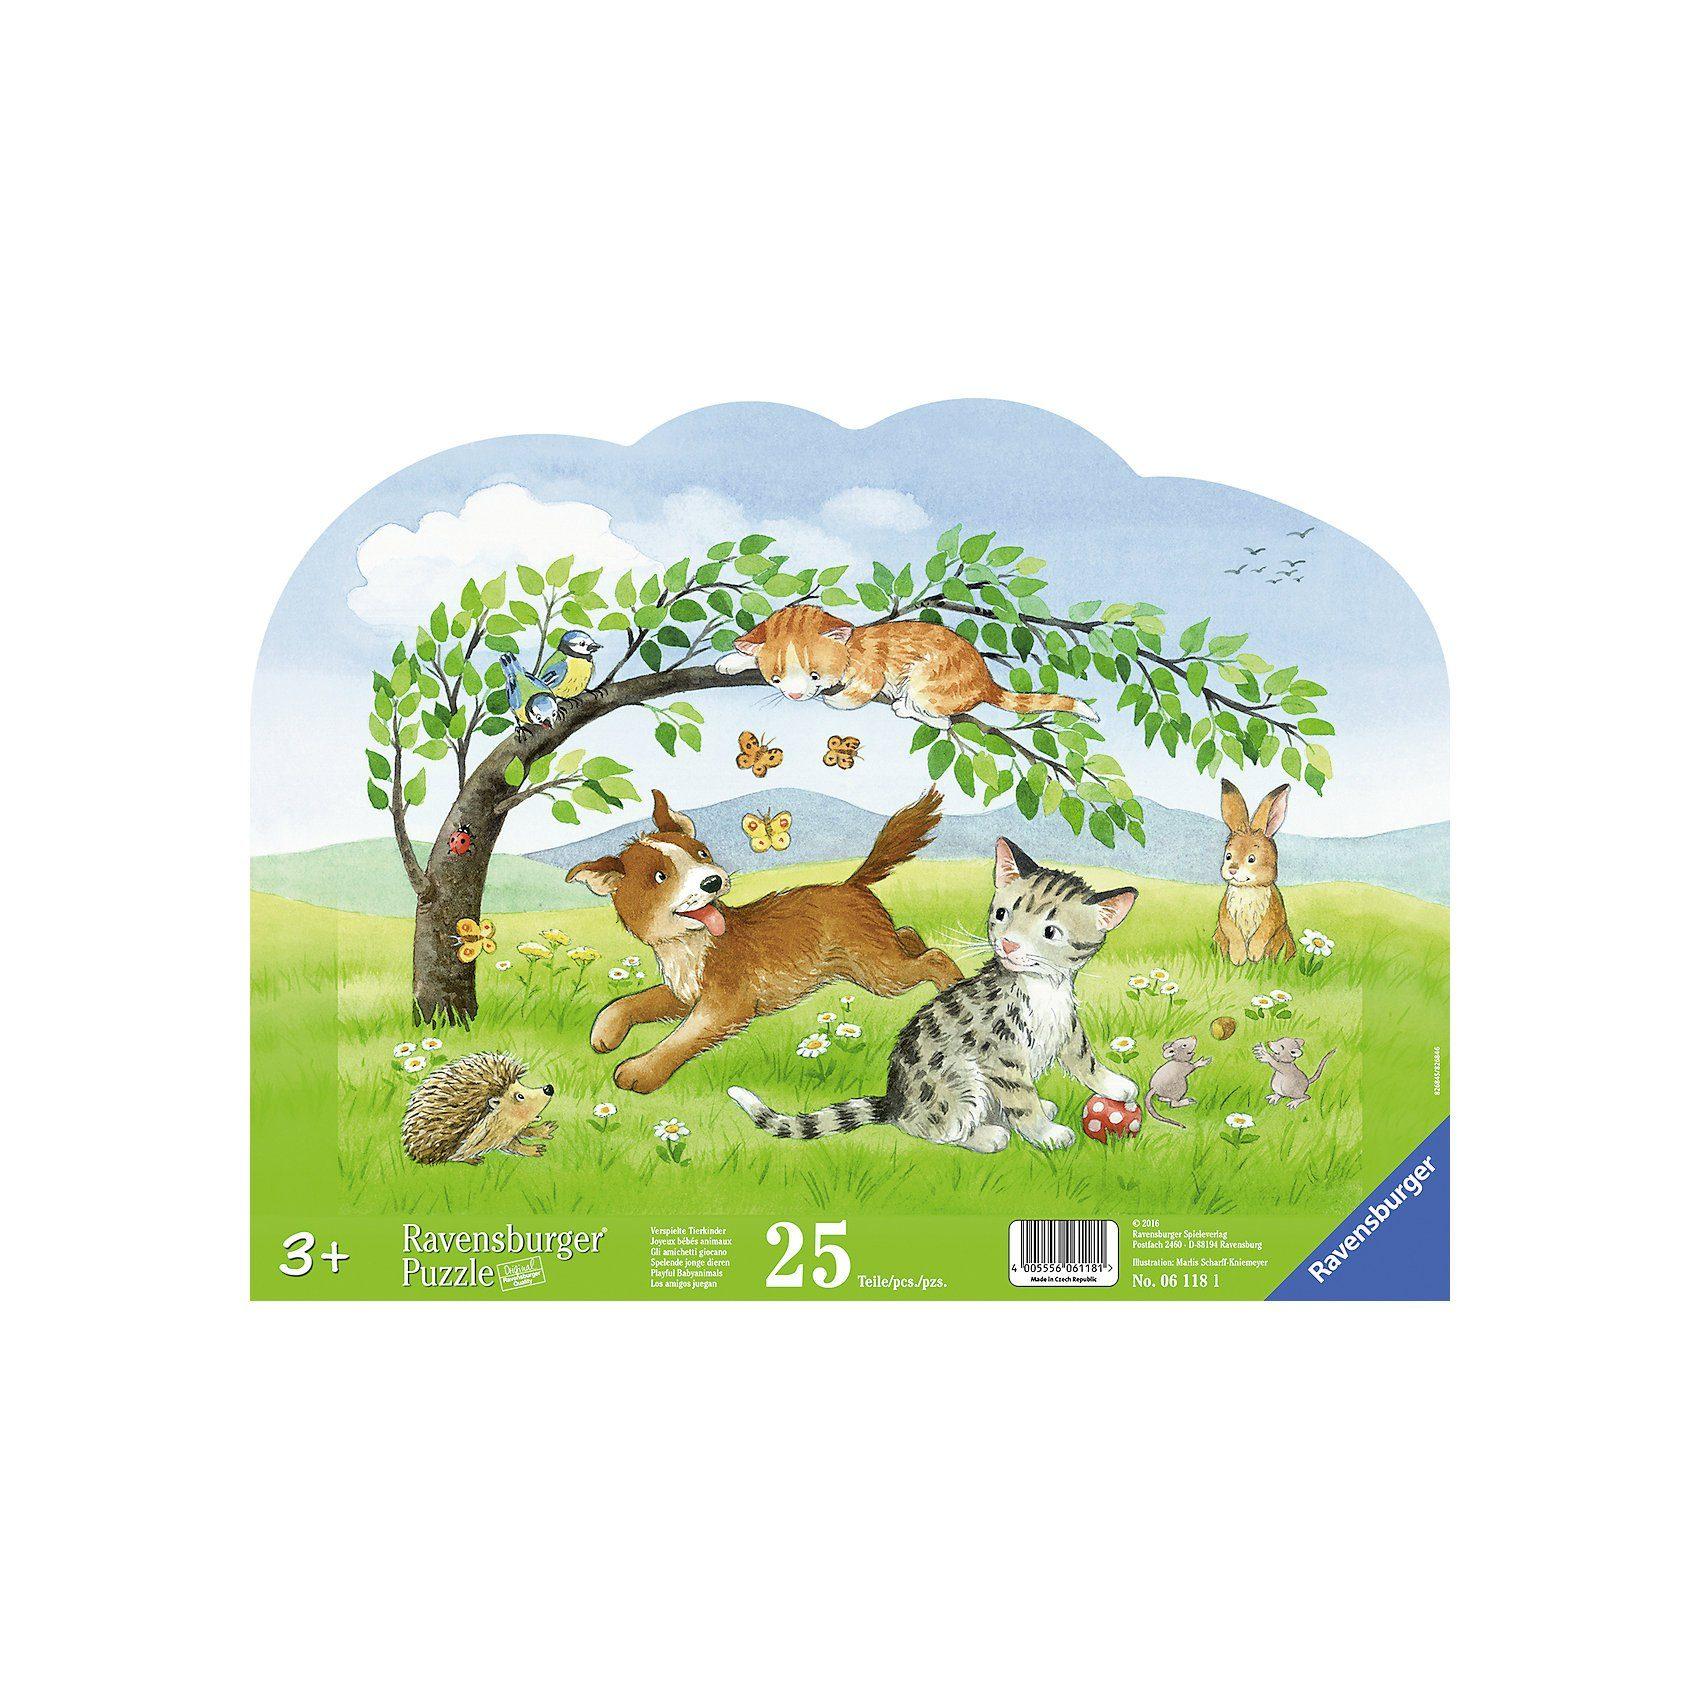 Ravensburger Rahmenpuzzle Verspielte Tierkinder 25 Teile